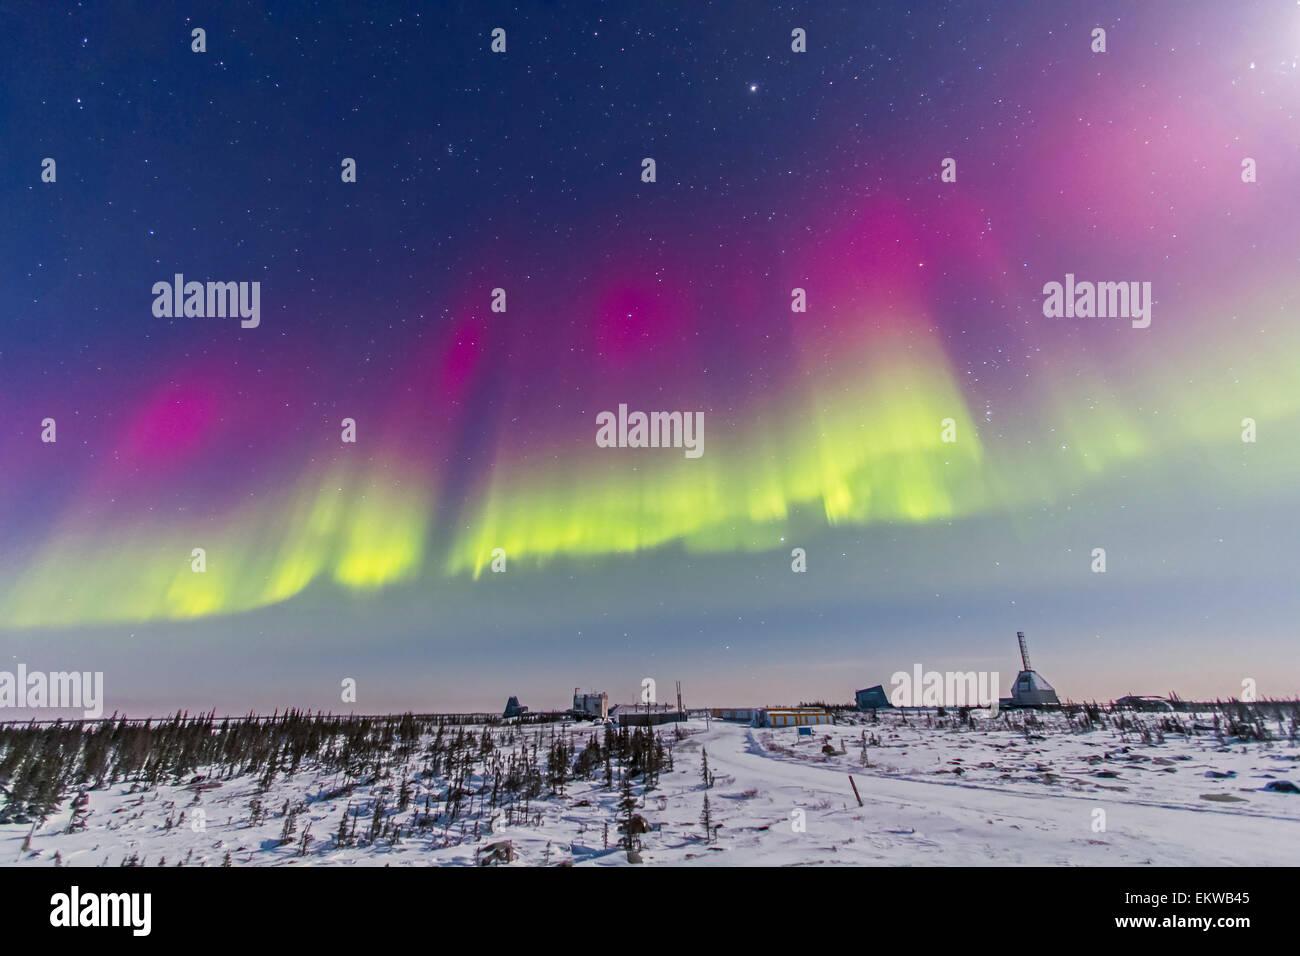 February 7, 2014 - Aurora borealis seen from Churchill